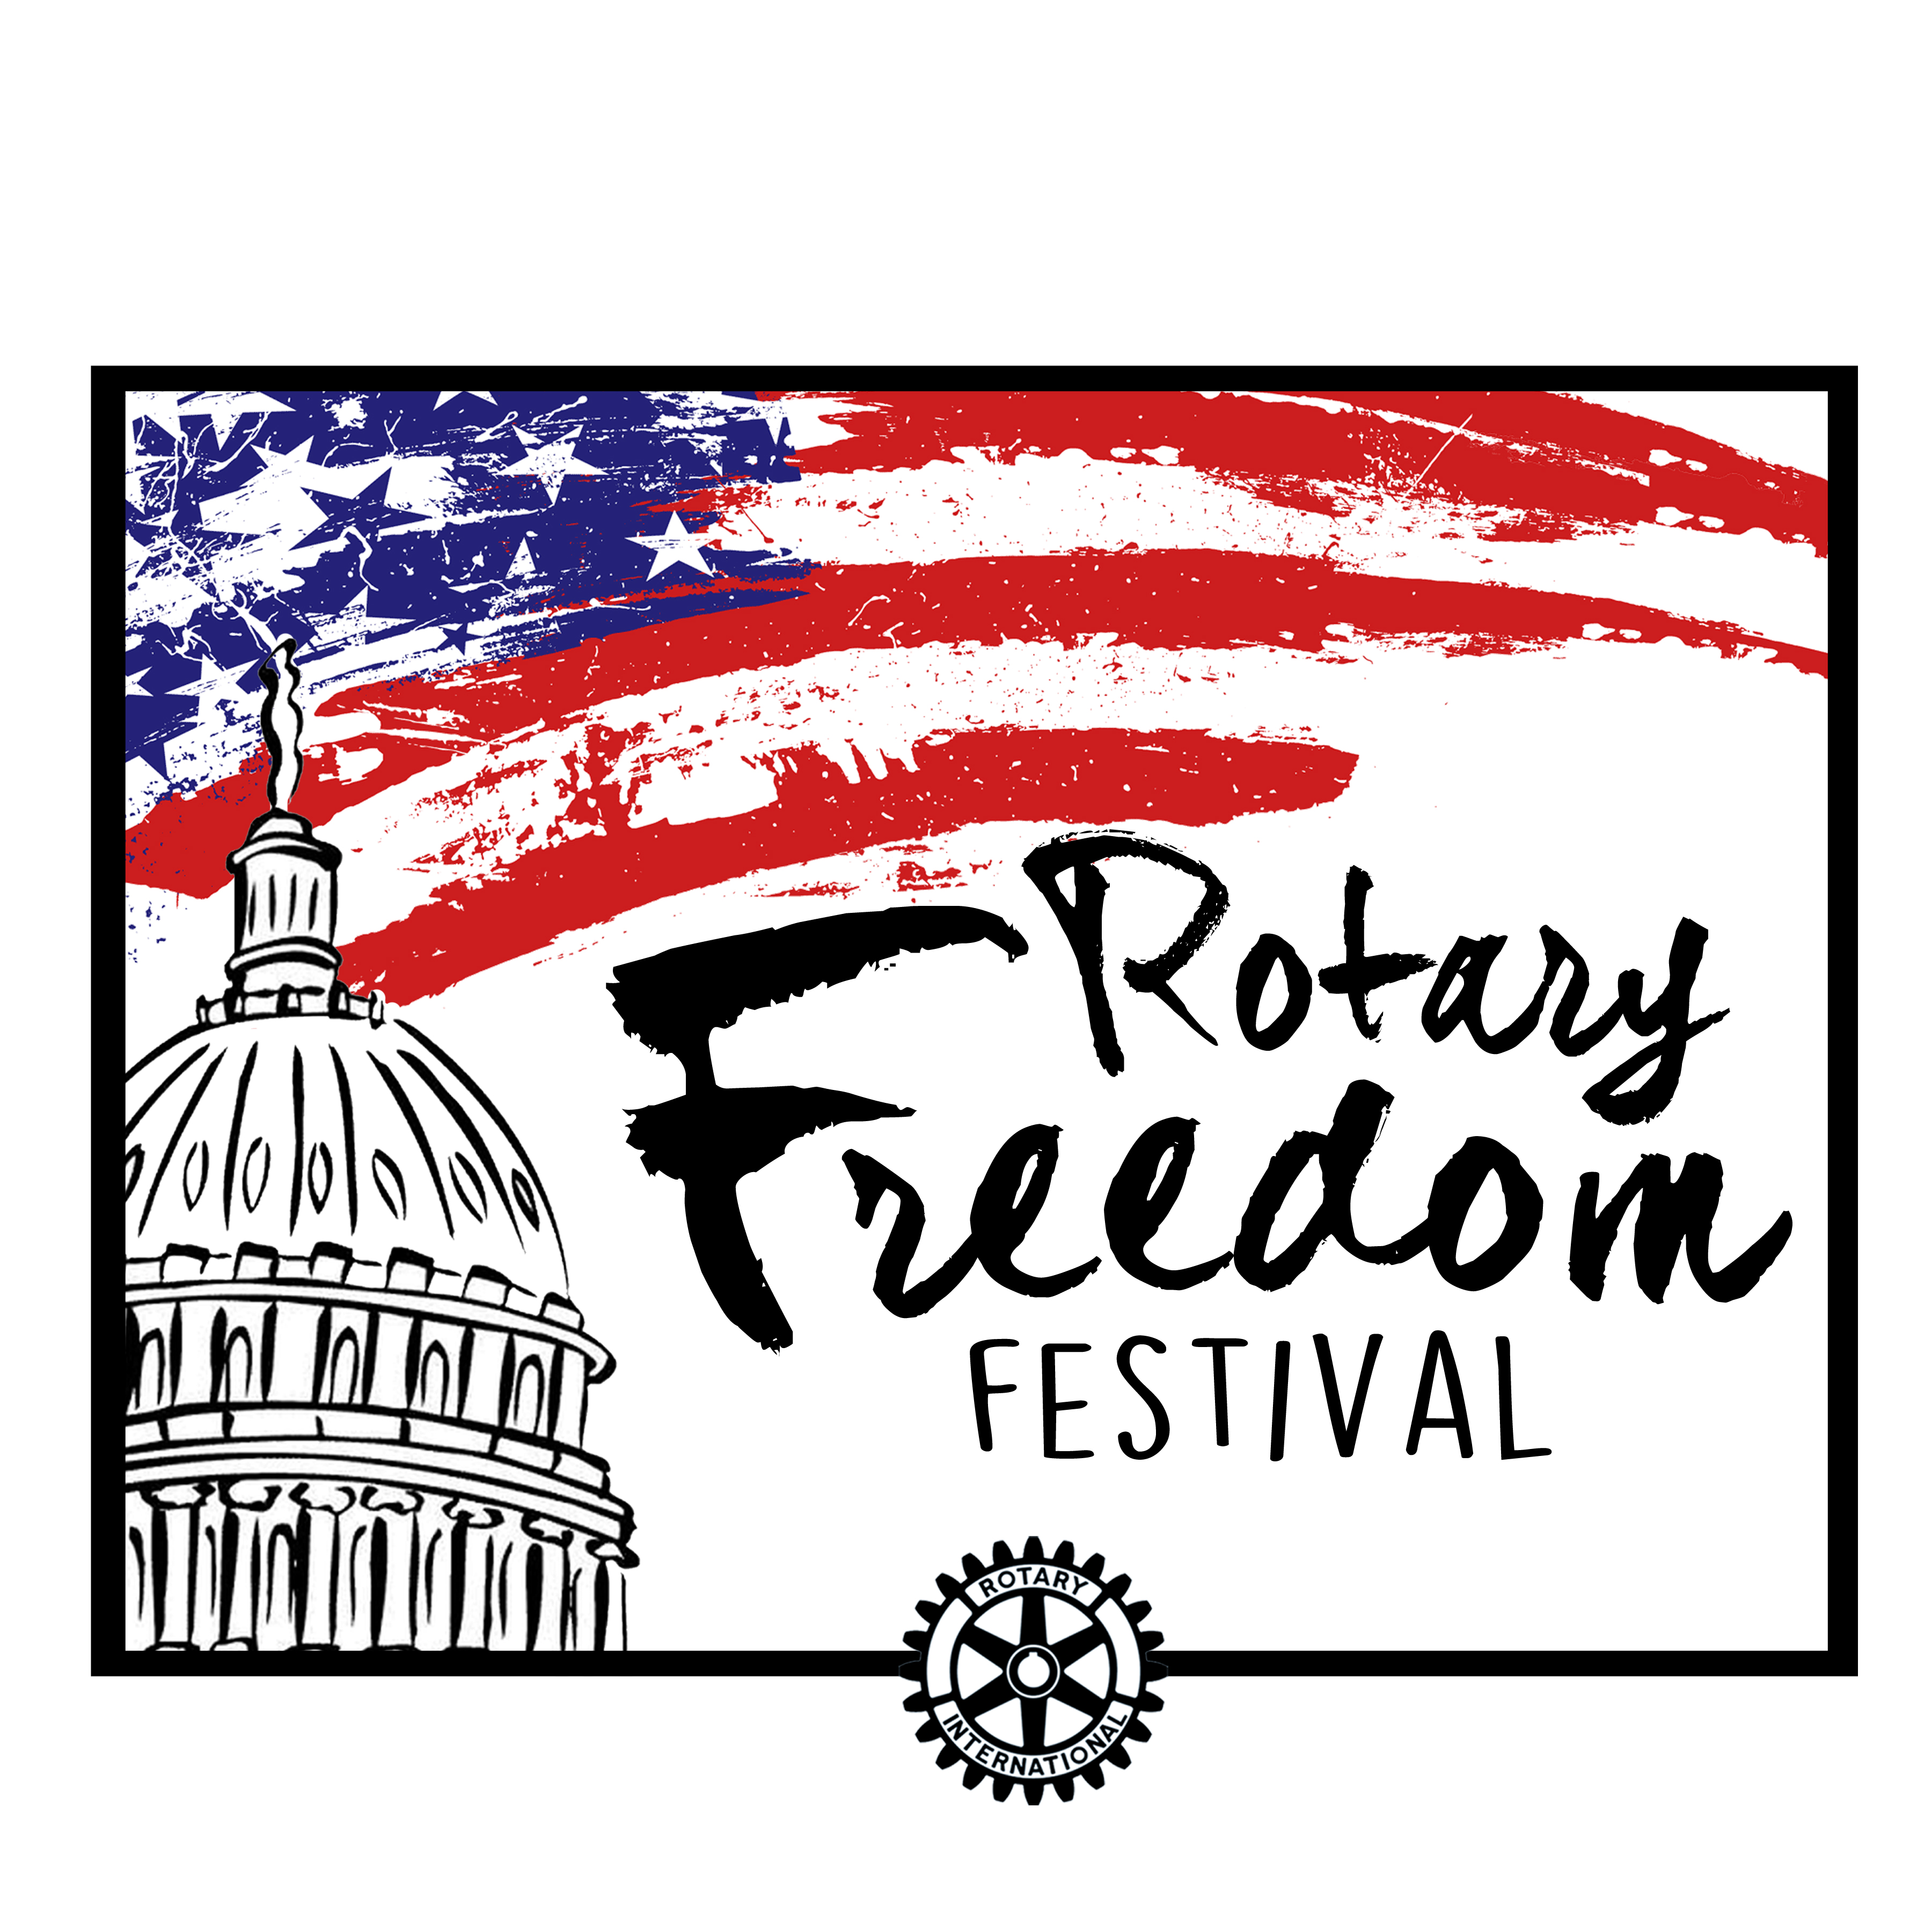 Rotary Freedom Festival in Topeka